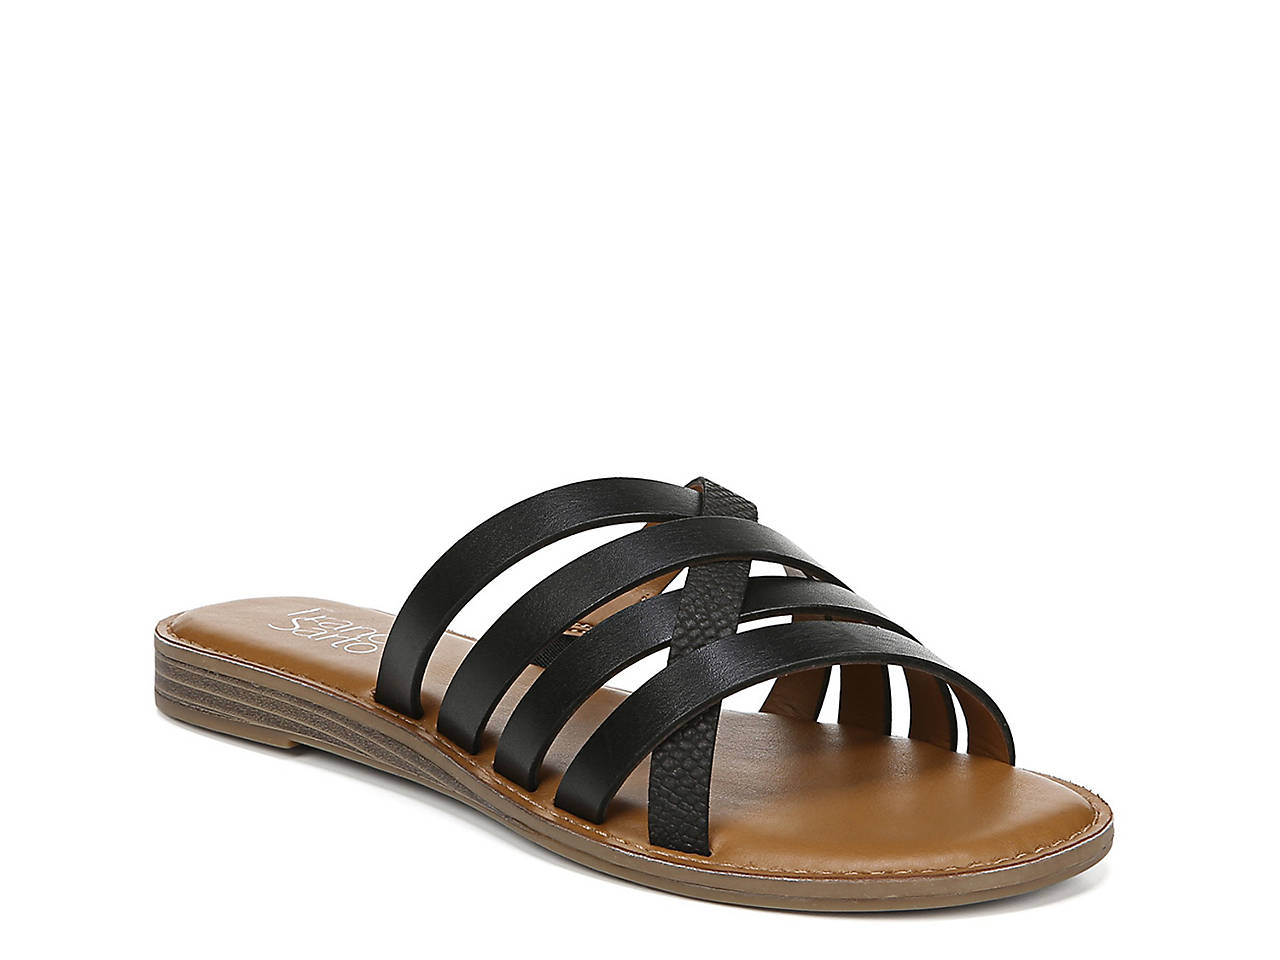 78b260a8b4f9 Franco Sarto Graceleigh Sandal Women s Shoes